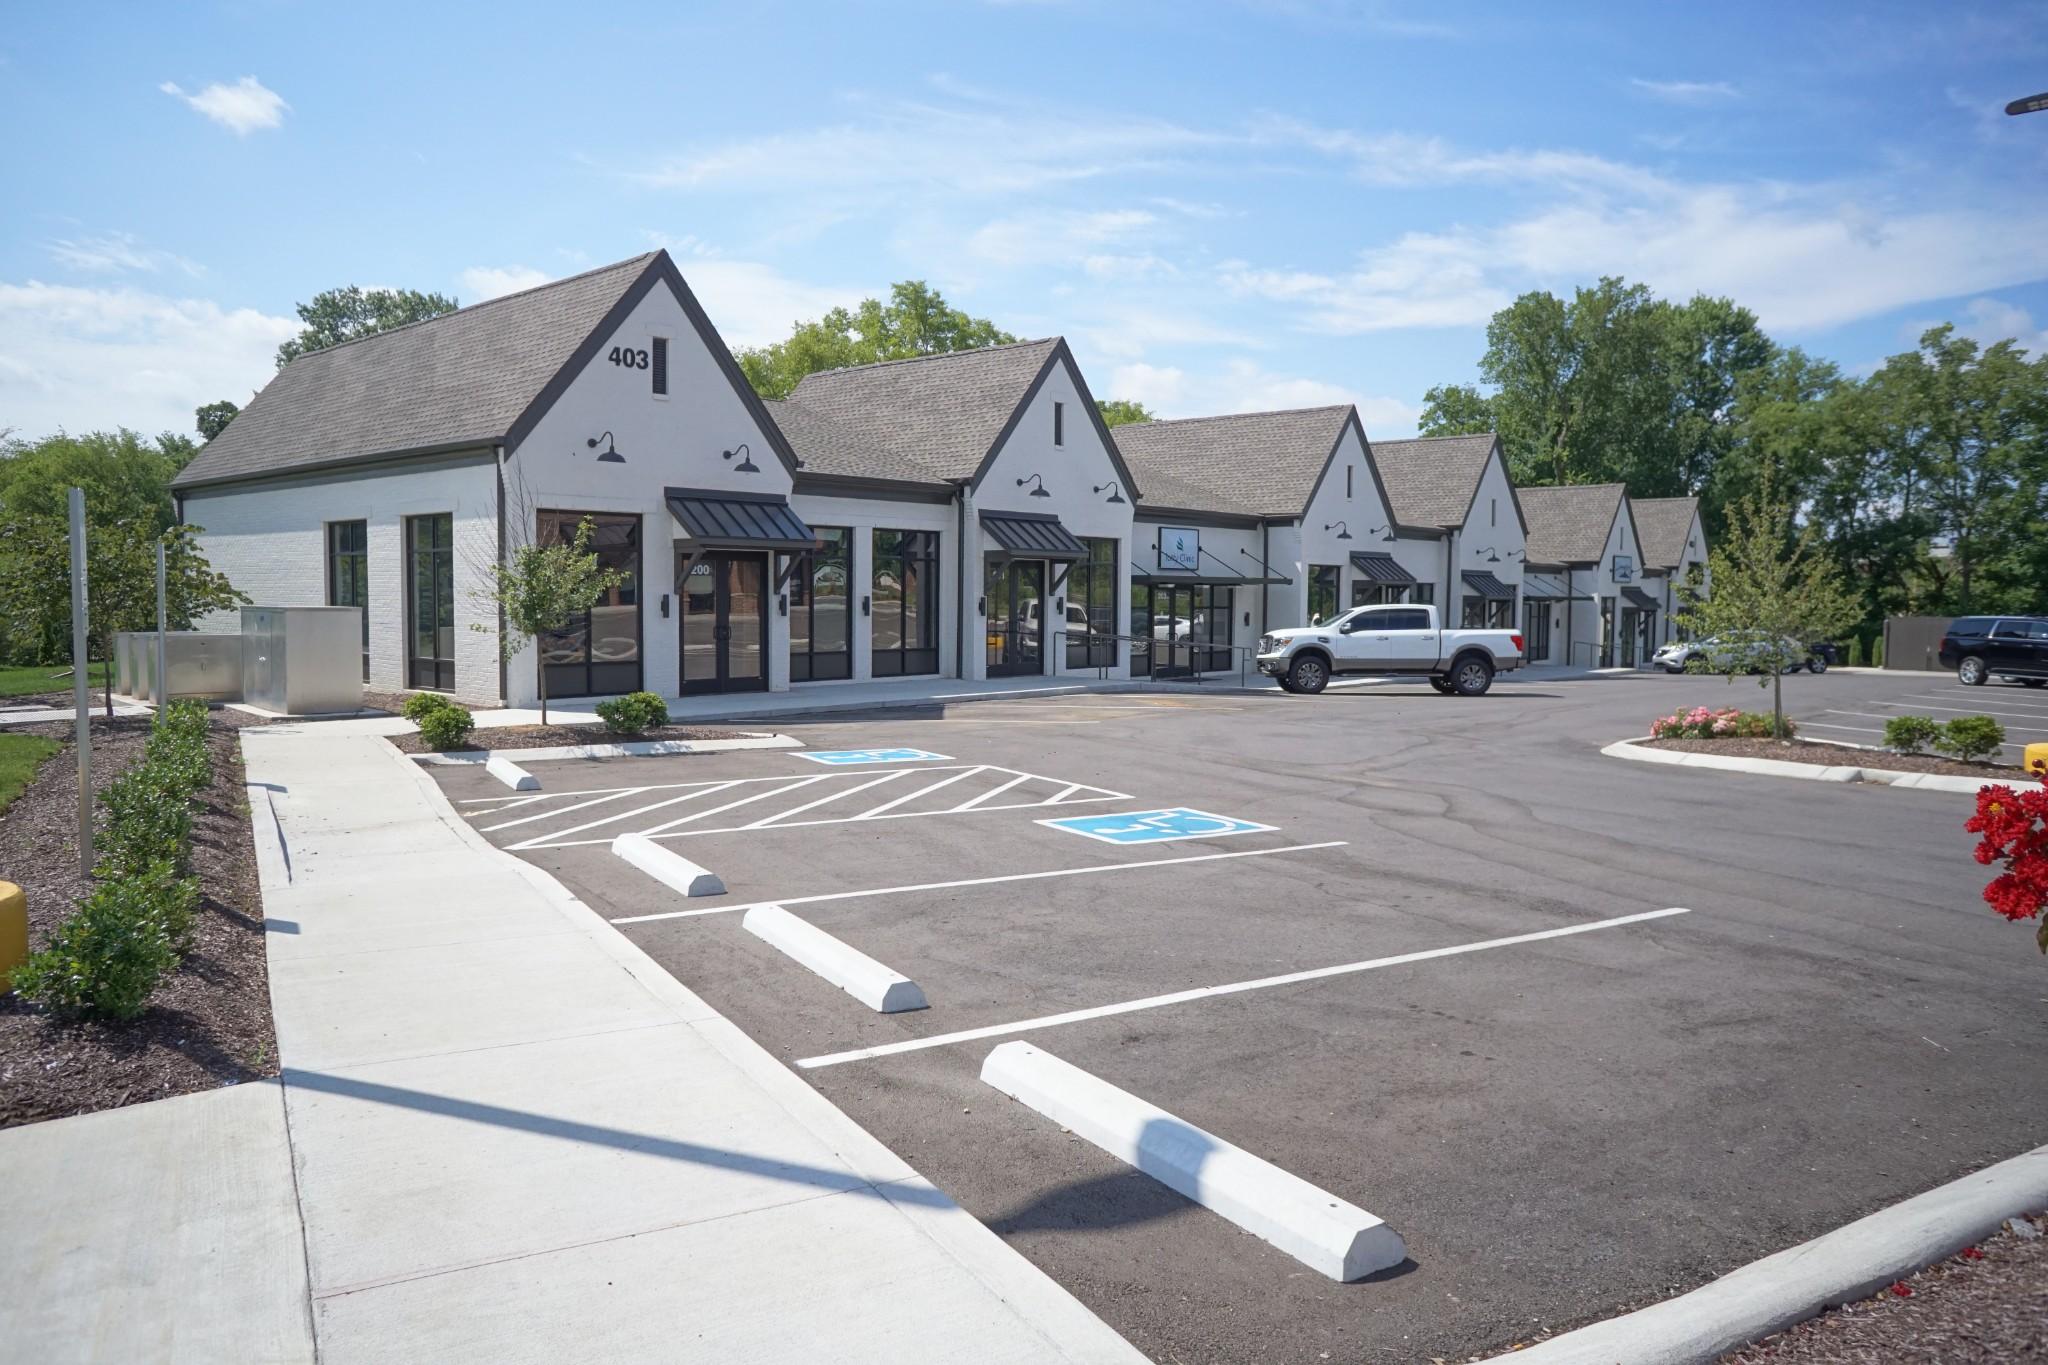 403 Long Hollow Pike, Goodlettsville, TN 37072 - Goodlettsville, TN real estate listing